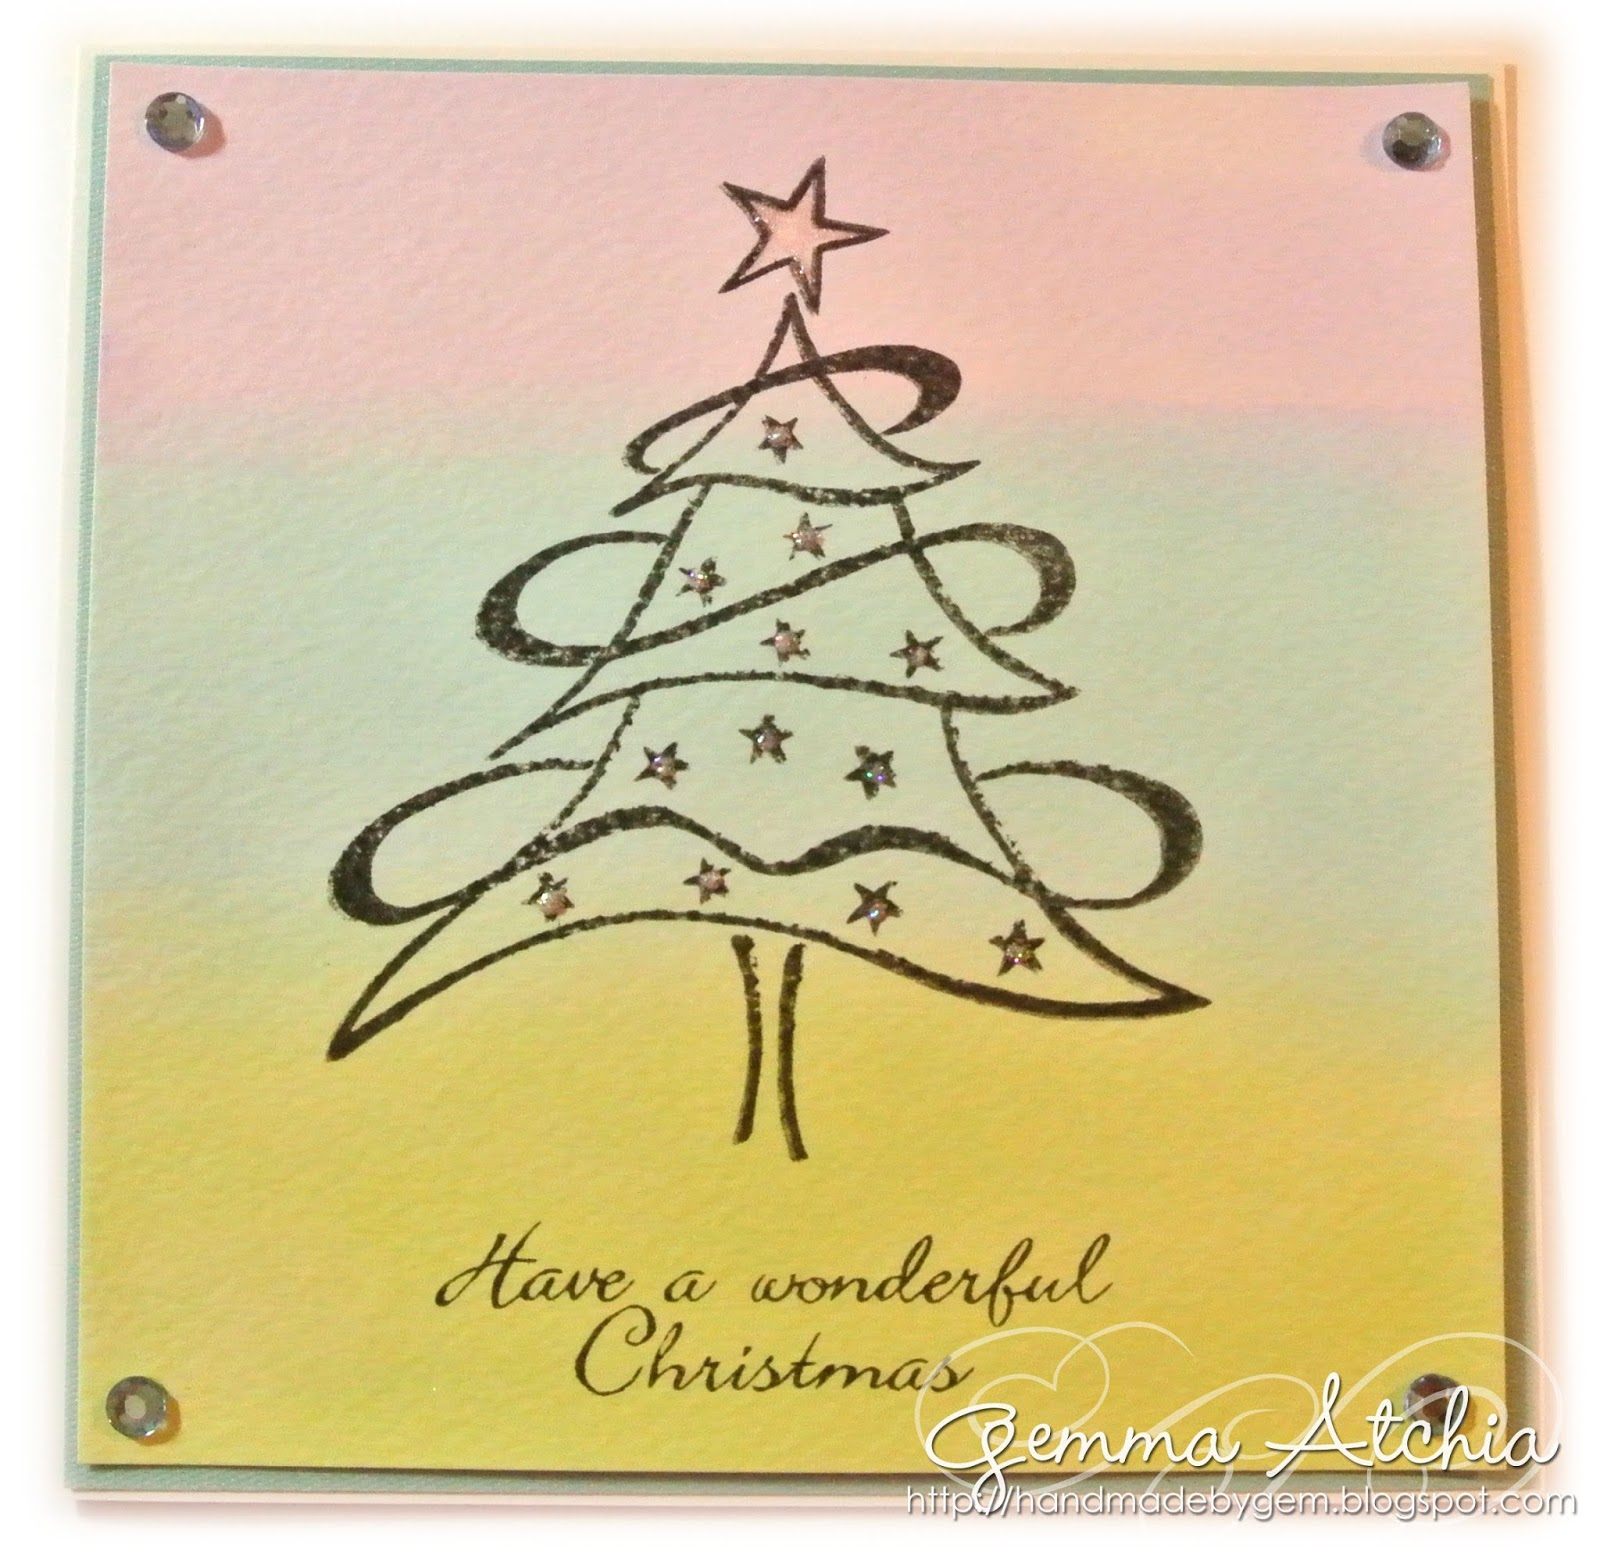 Christmas, Aquatint, Tree, Star, pearls, pastels